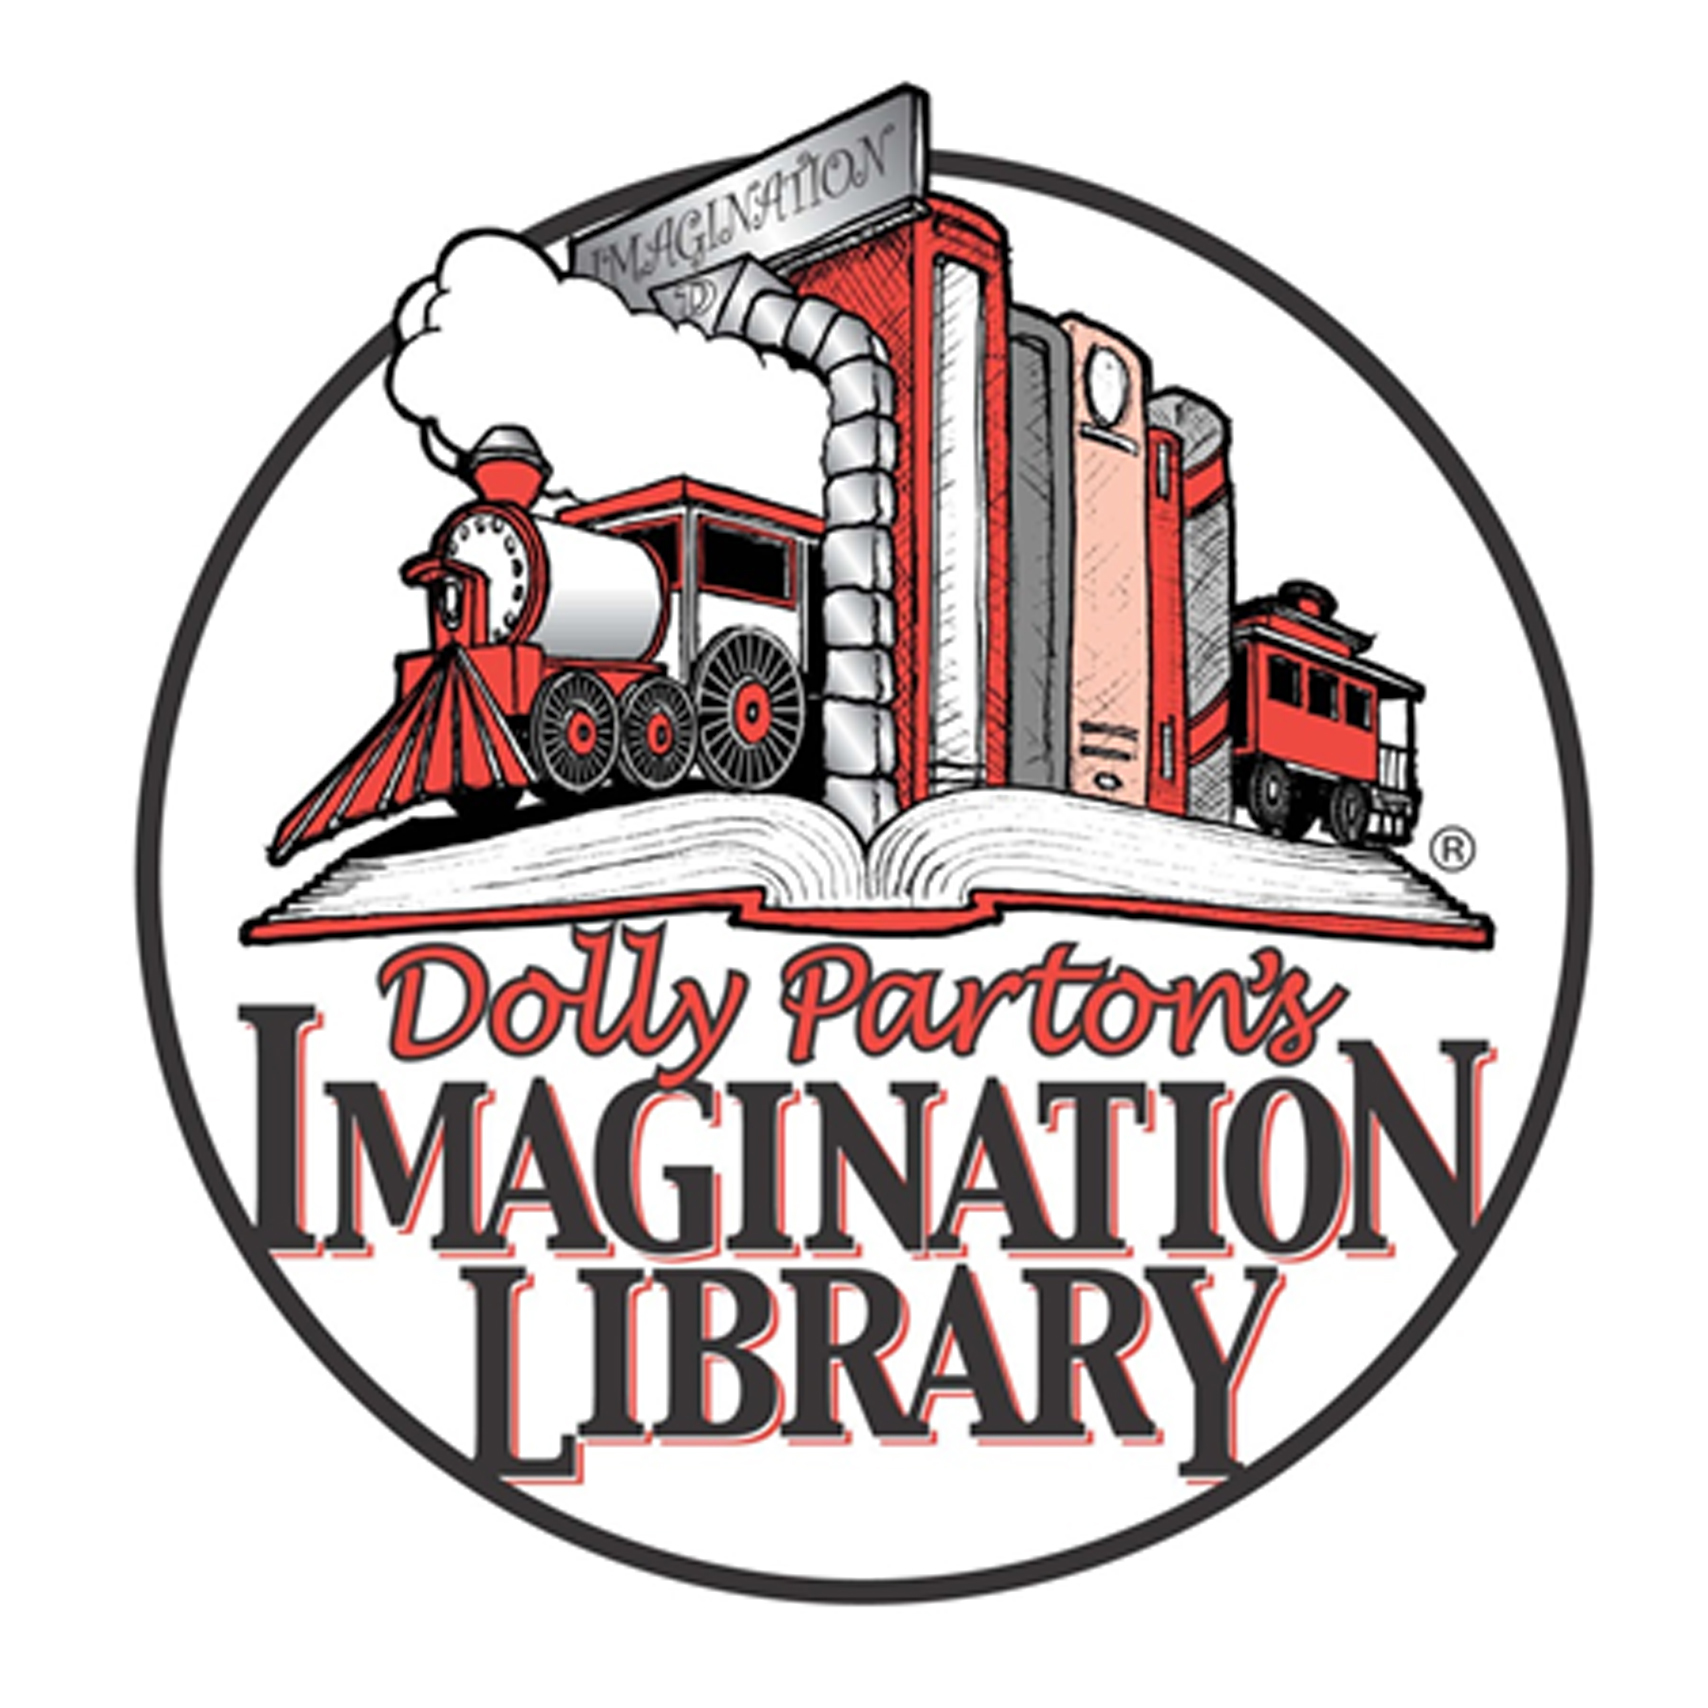 Dolly parton imagination library logo